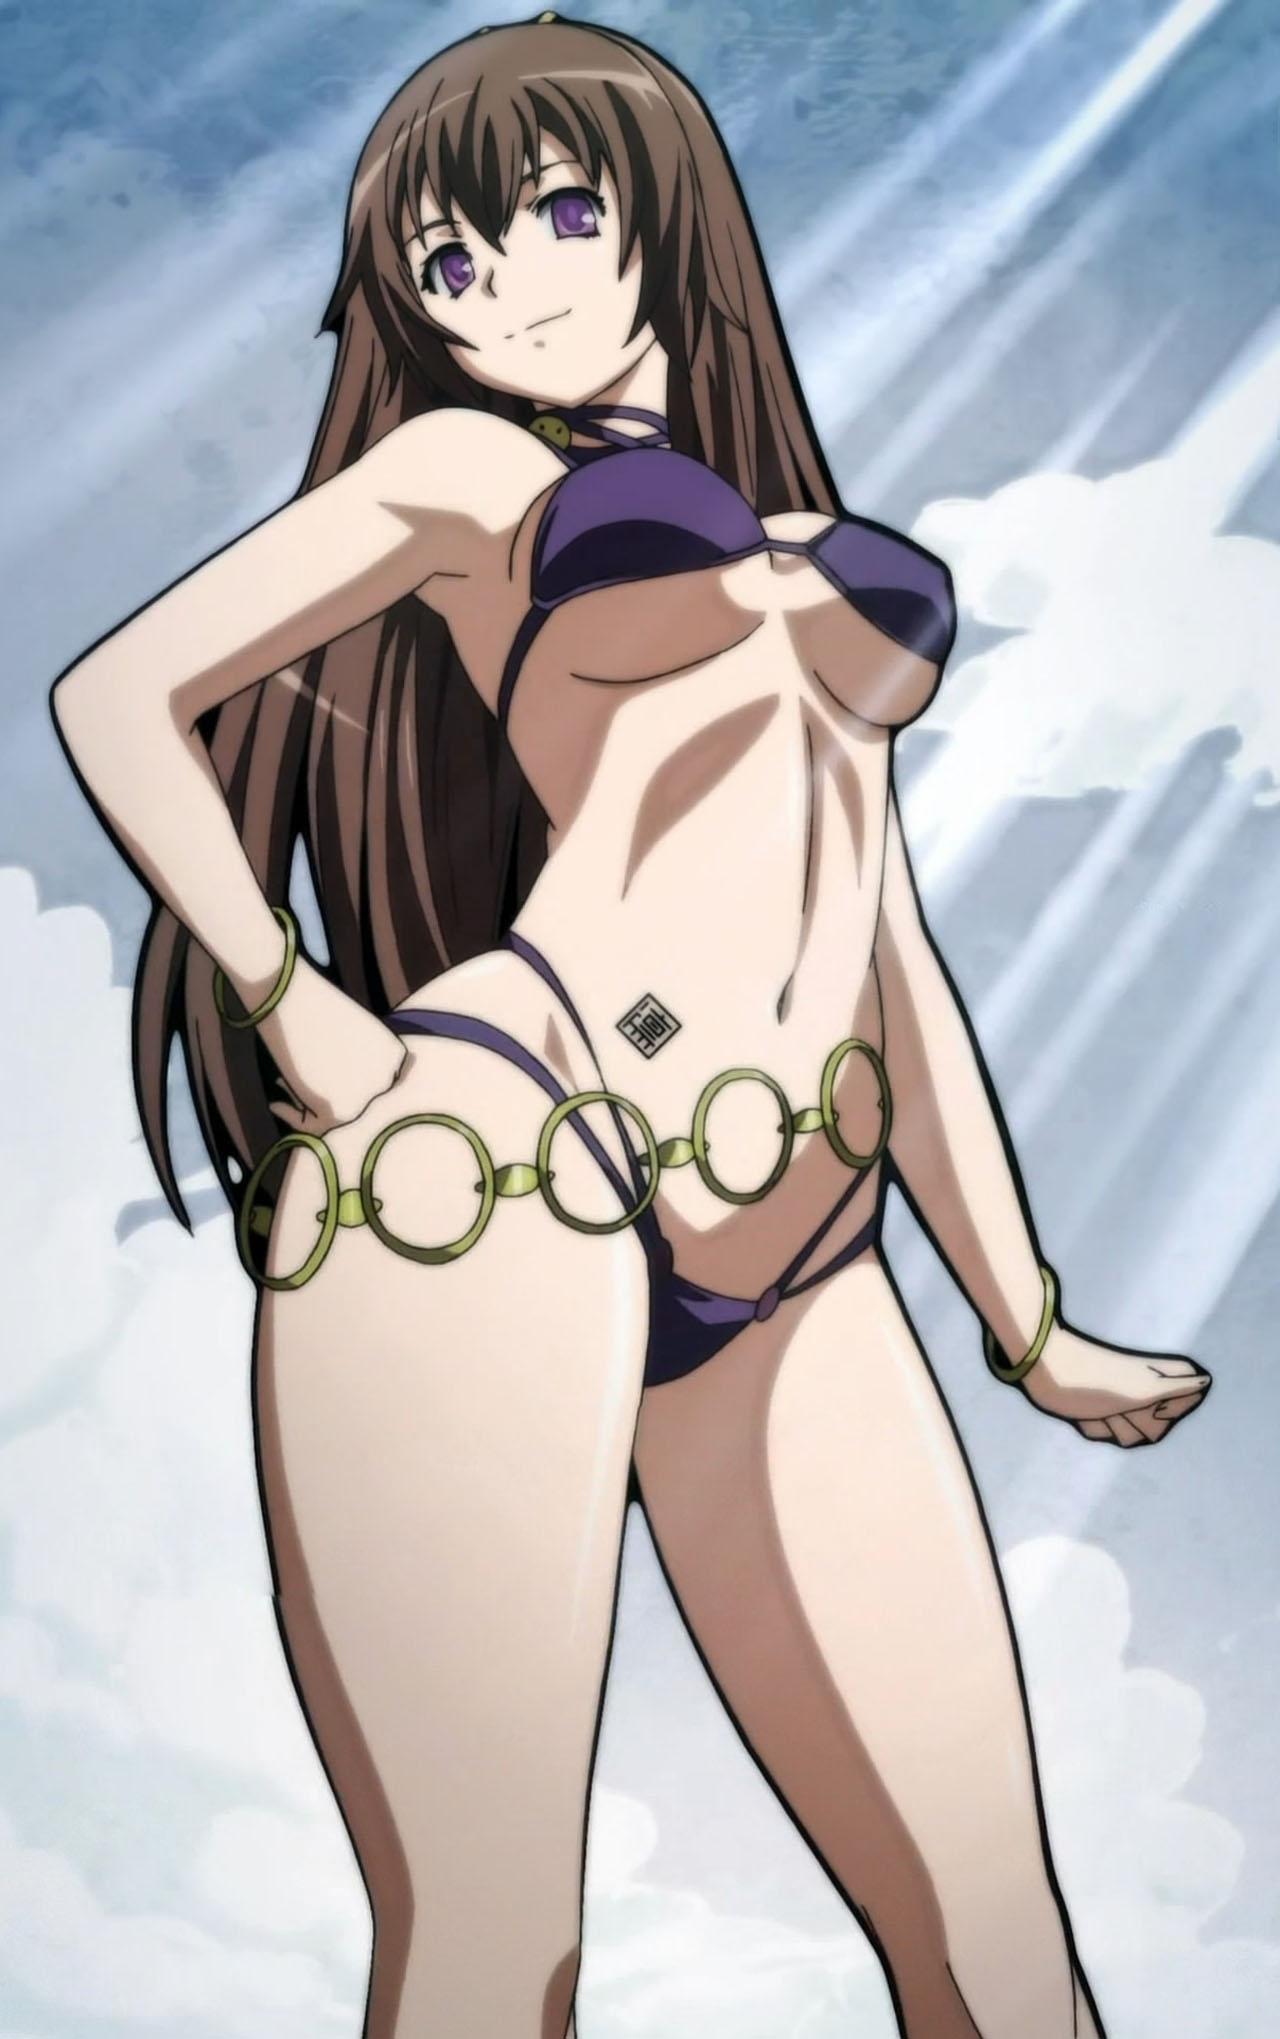 Samurai sexy hot girl pics nude movie